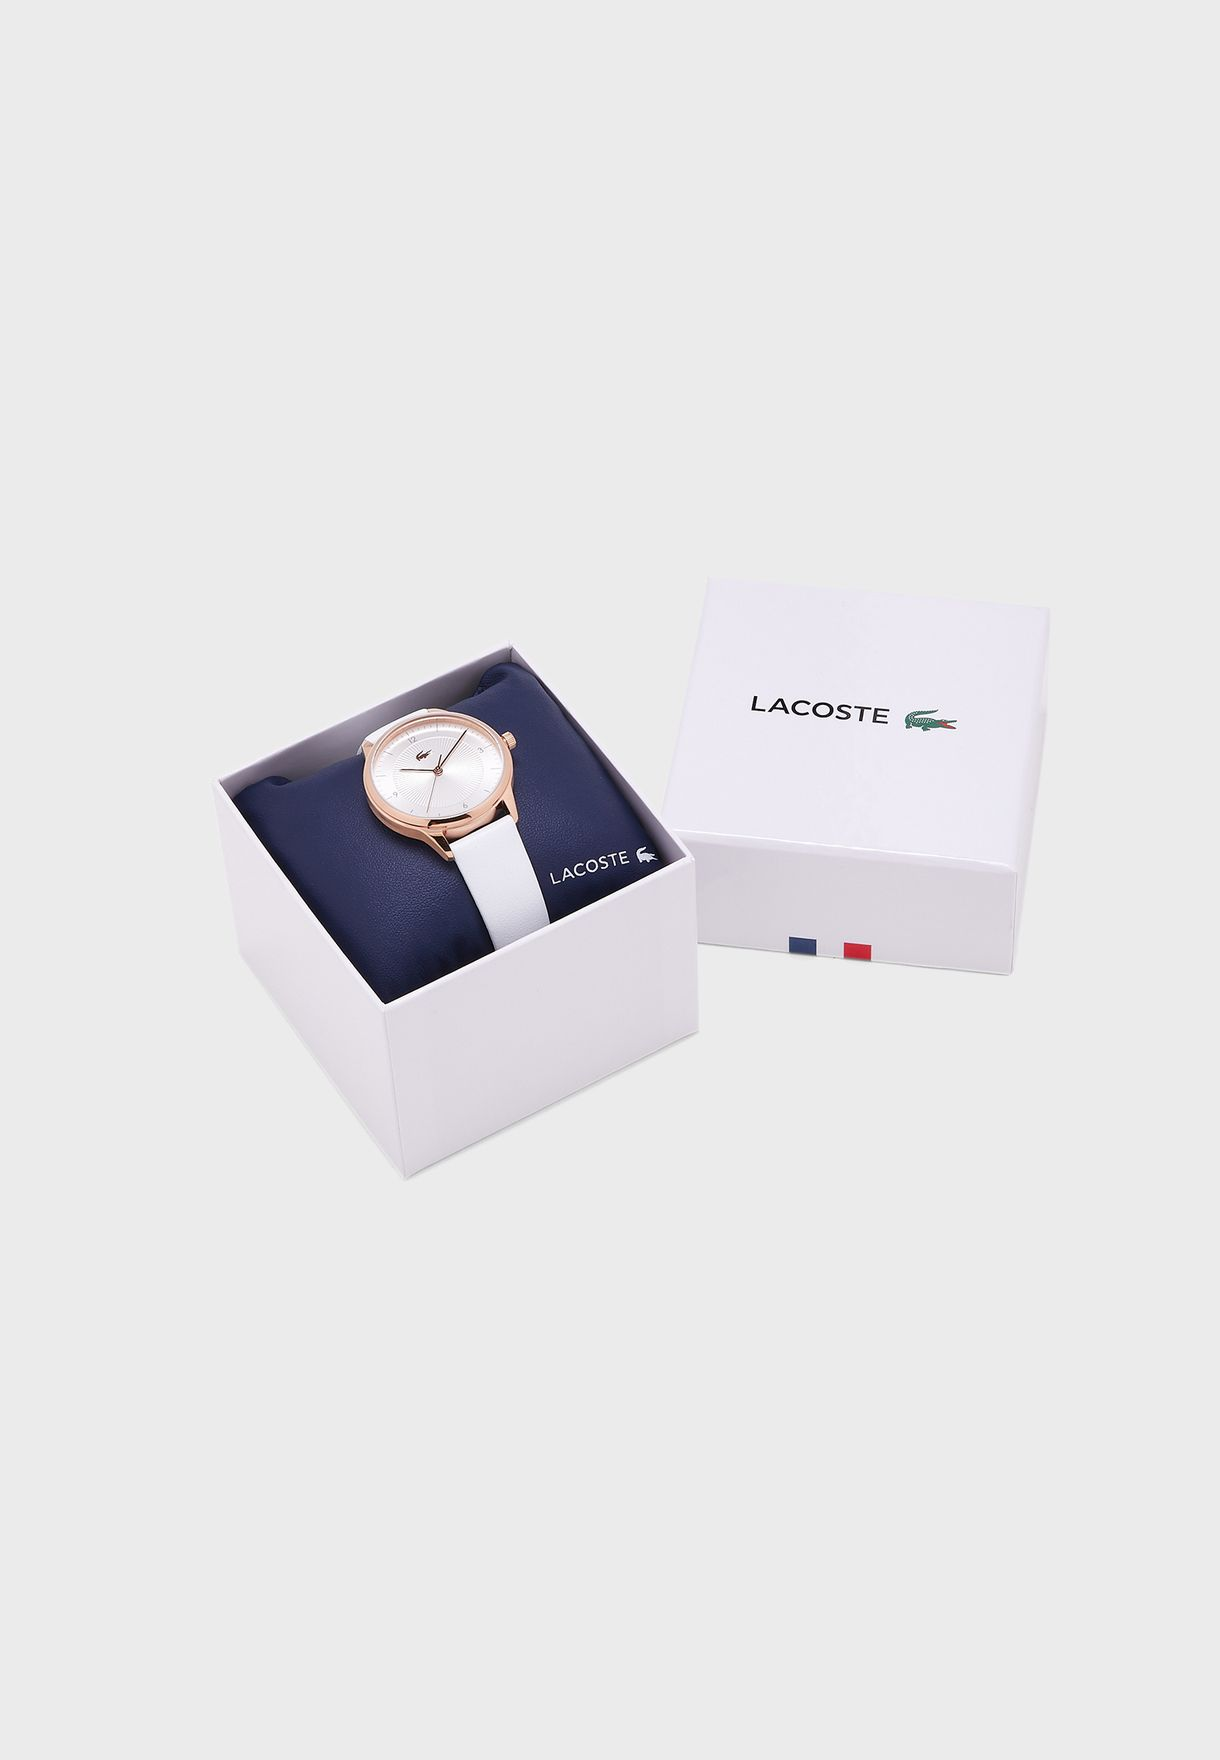 Lacoste Club Analog Watch